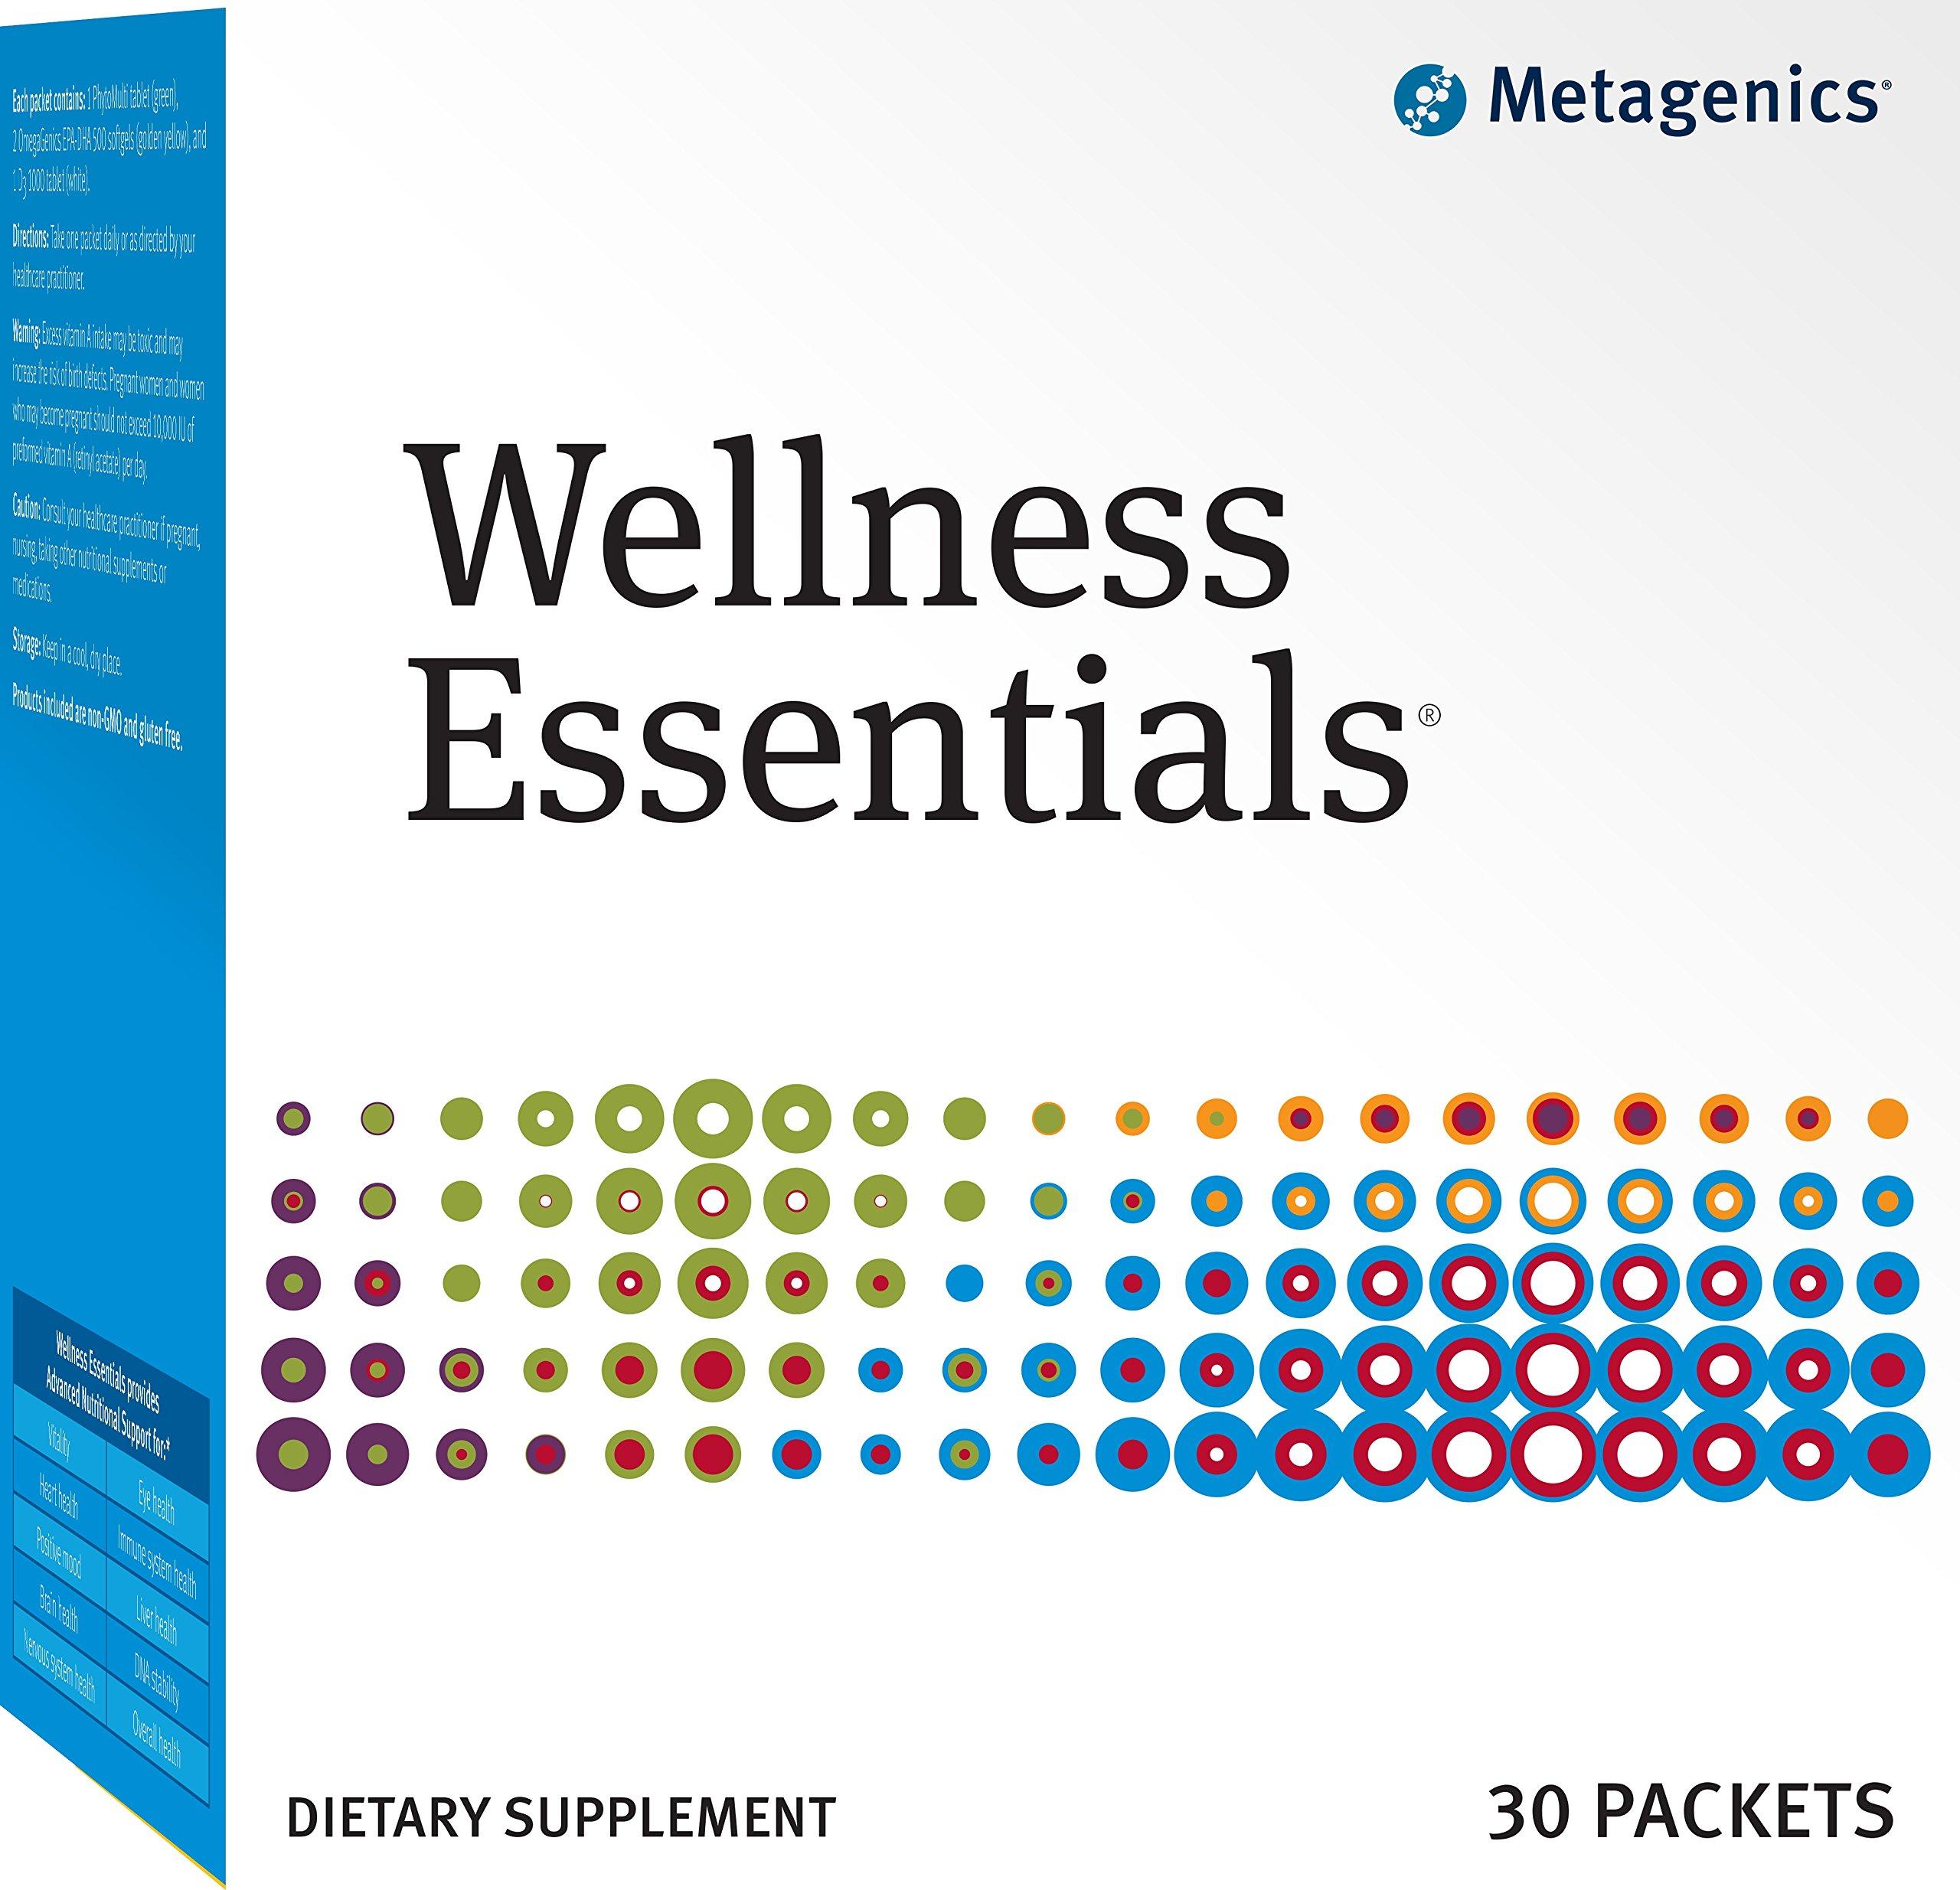 Metagenics - Wellness Essentials, 30 Count